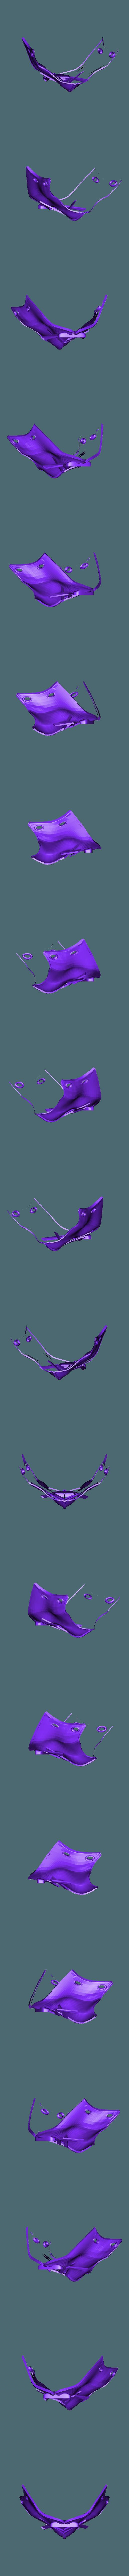 model alan walker barra.stl Download free 3DS file Alan Walker Coronavirus protection mask (COVID-19) MOD 1 #3DvsCOVID19 • 3D printer object, ronaldocc13